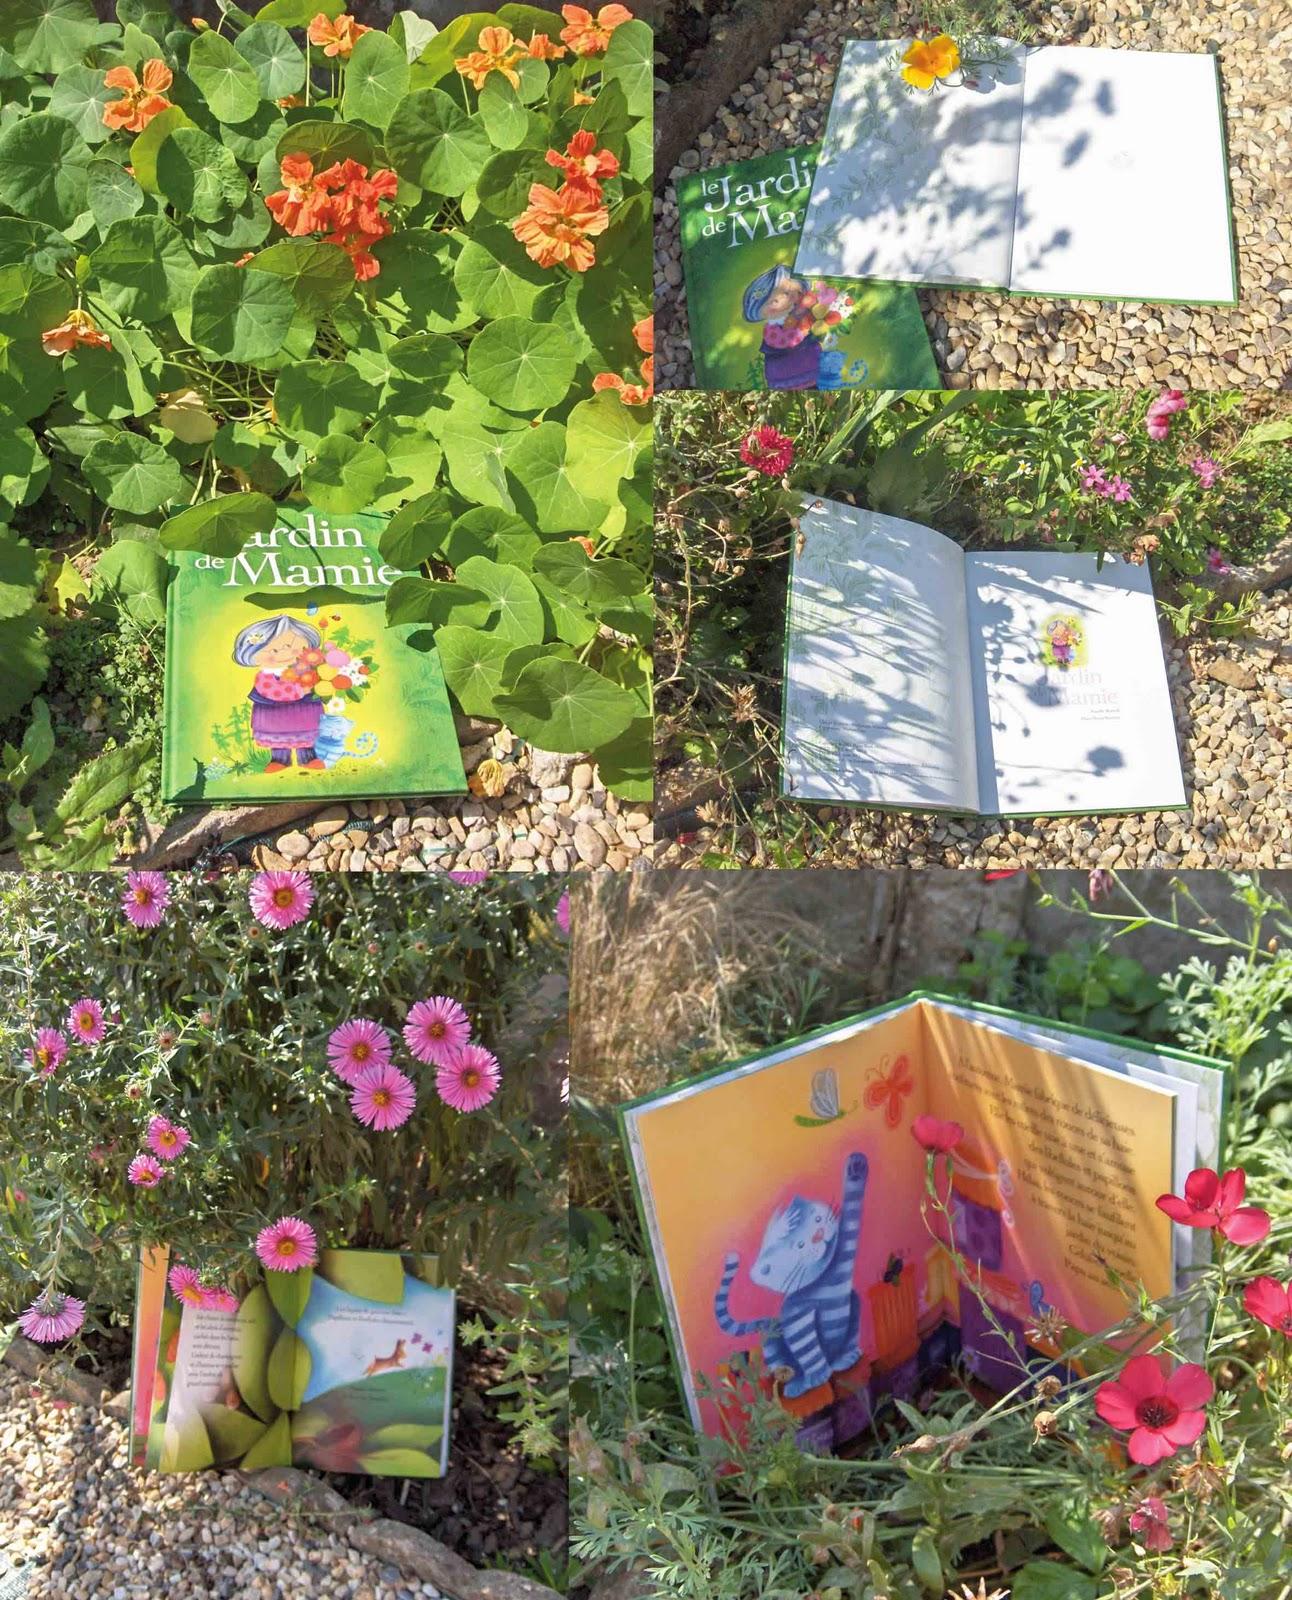 Emorine marie pierre illustratrice jeunesse une petite mamie dans mon jardin - Mamie baise dans le jardin ...